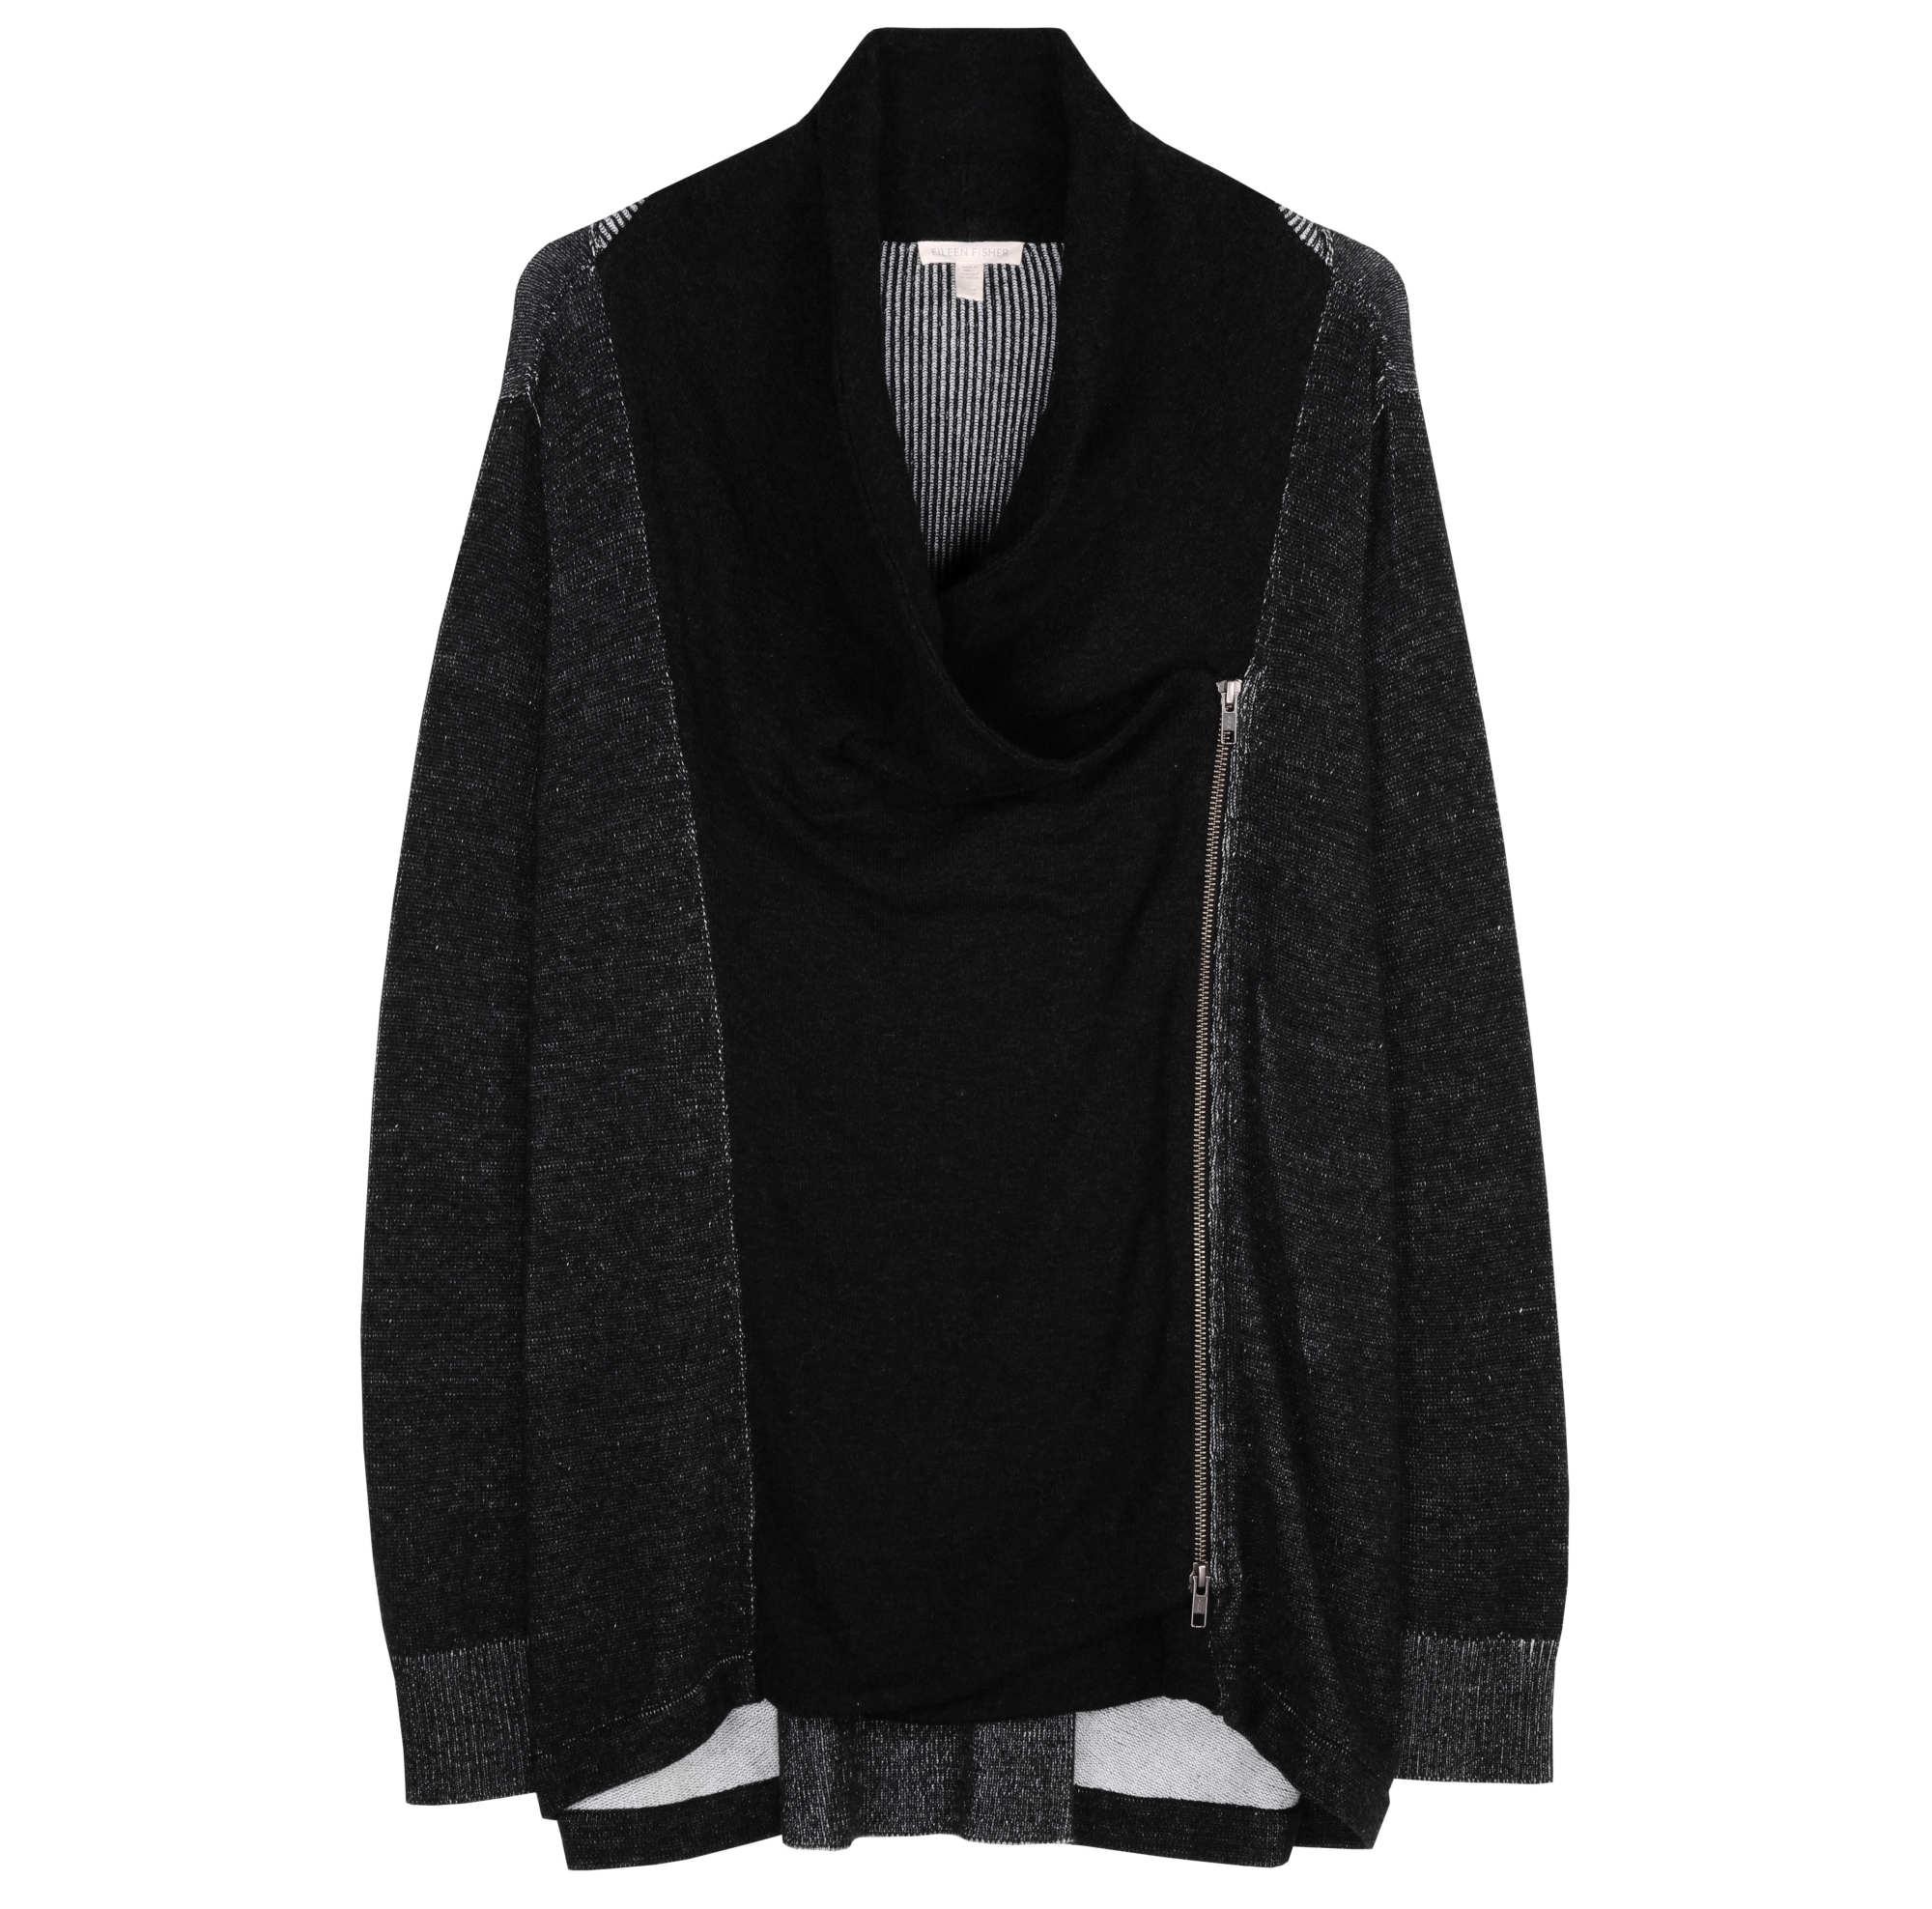 Peruvian Plaited Organic Cotton Jacket